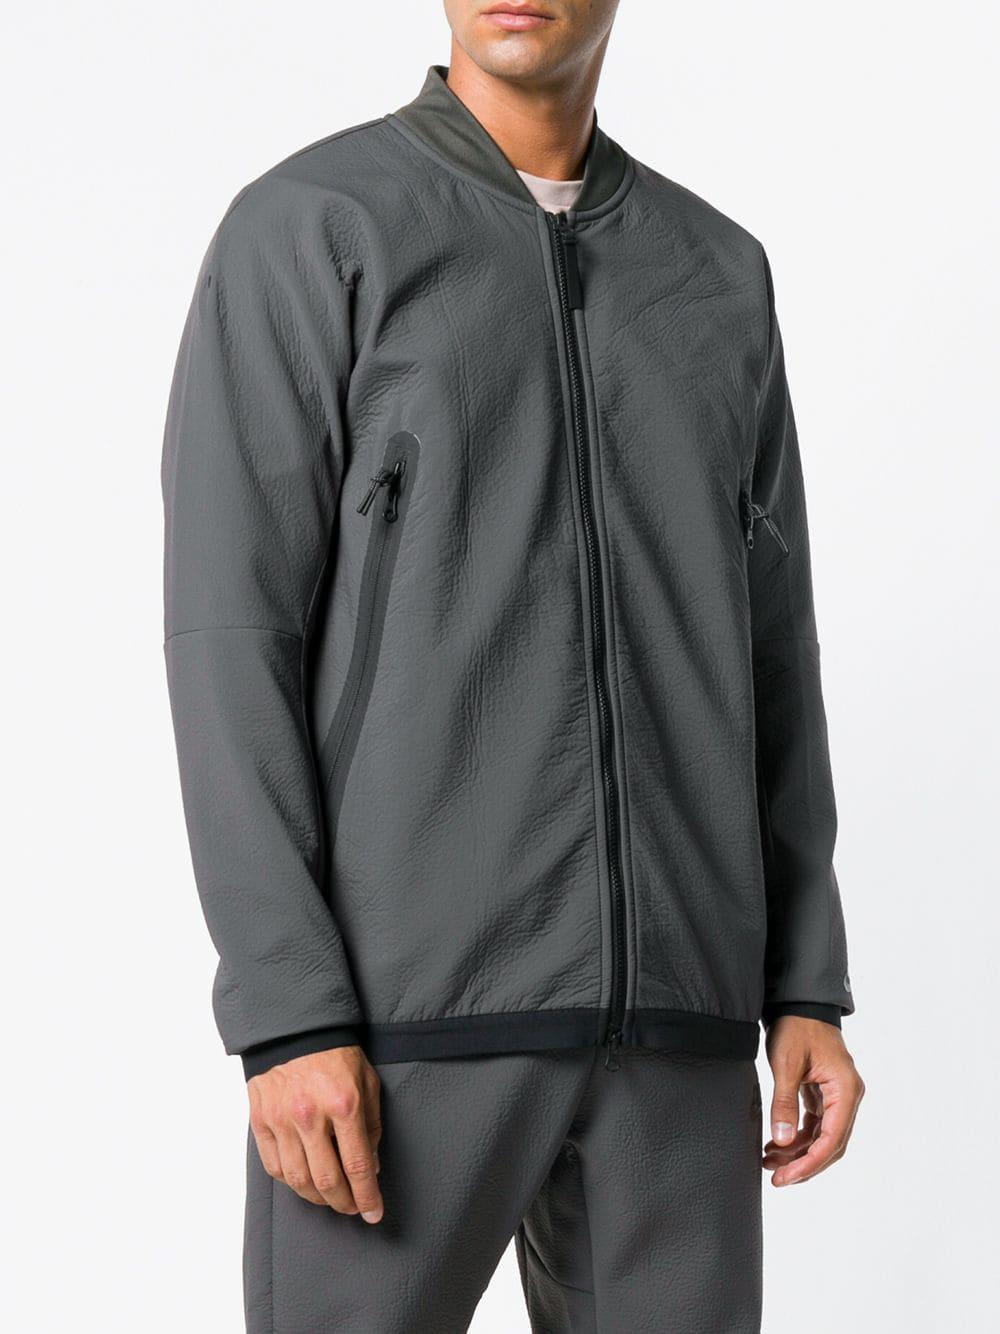 34db523edec6 Lyst - Nike Lightweight Sports Jacket in Green for Men